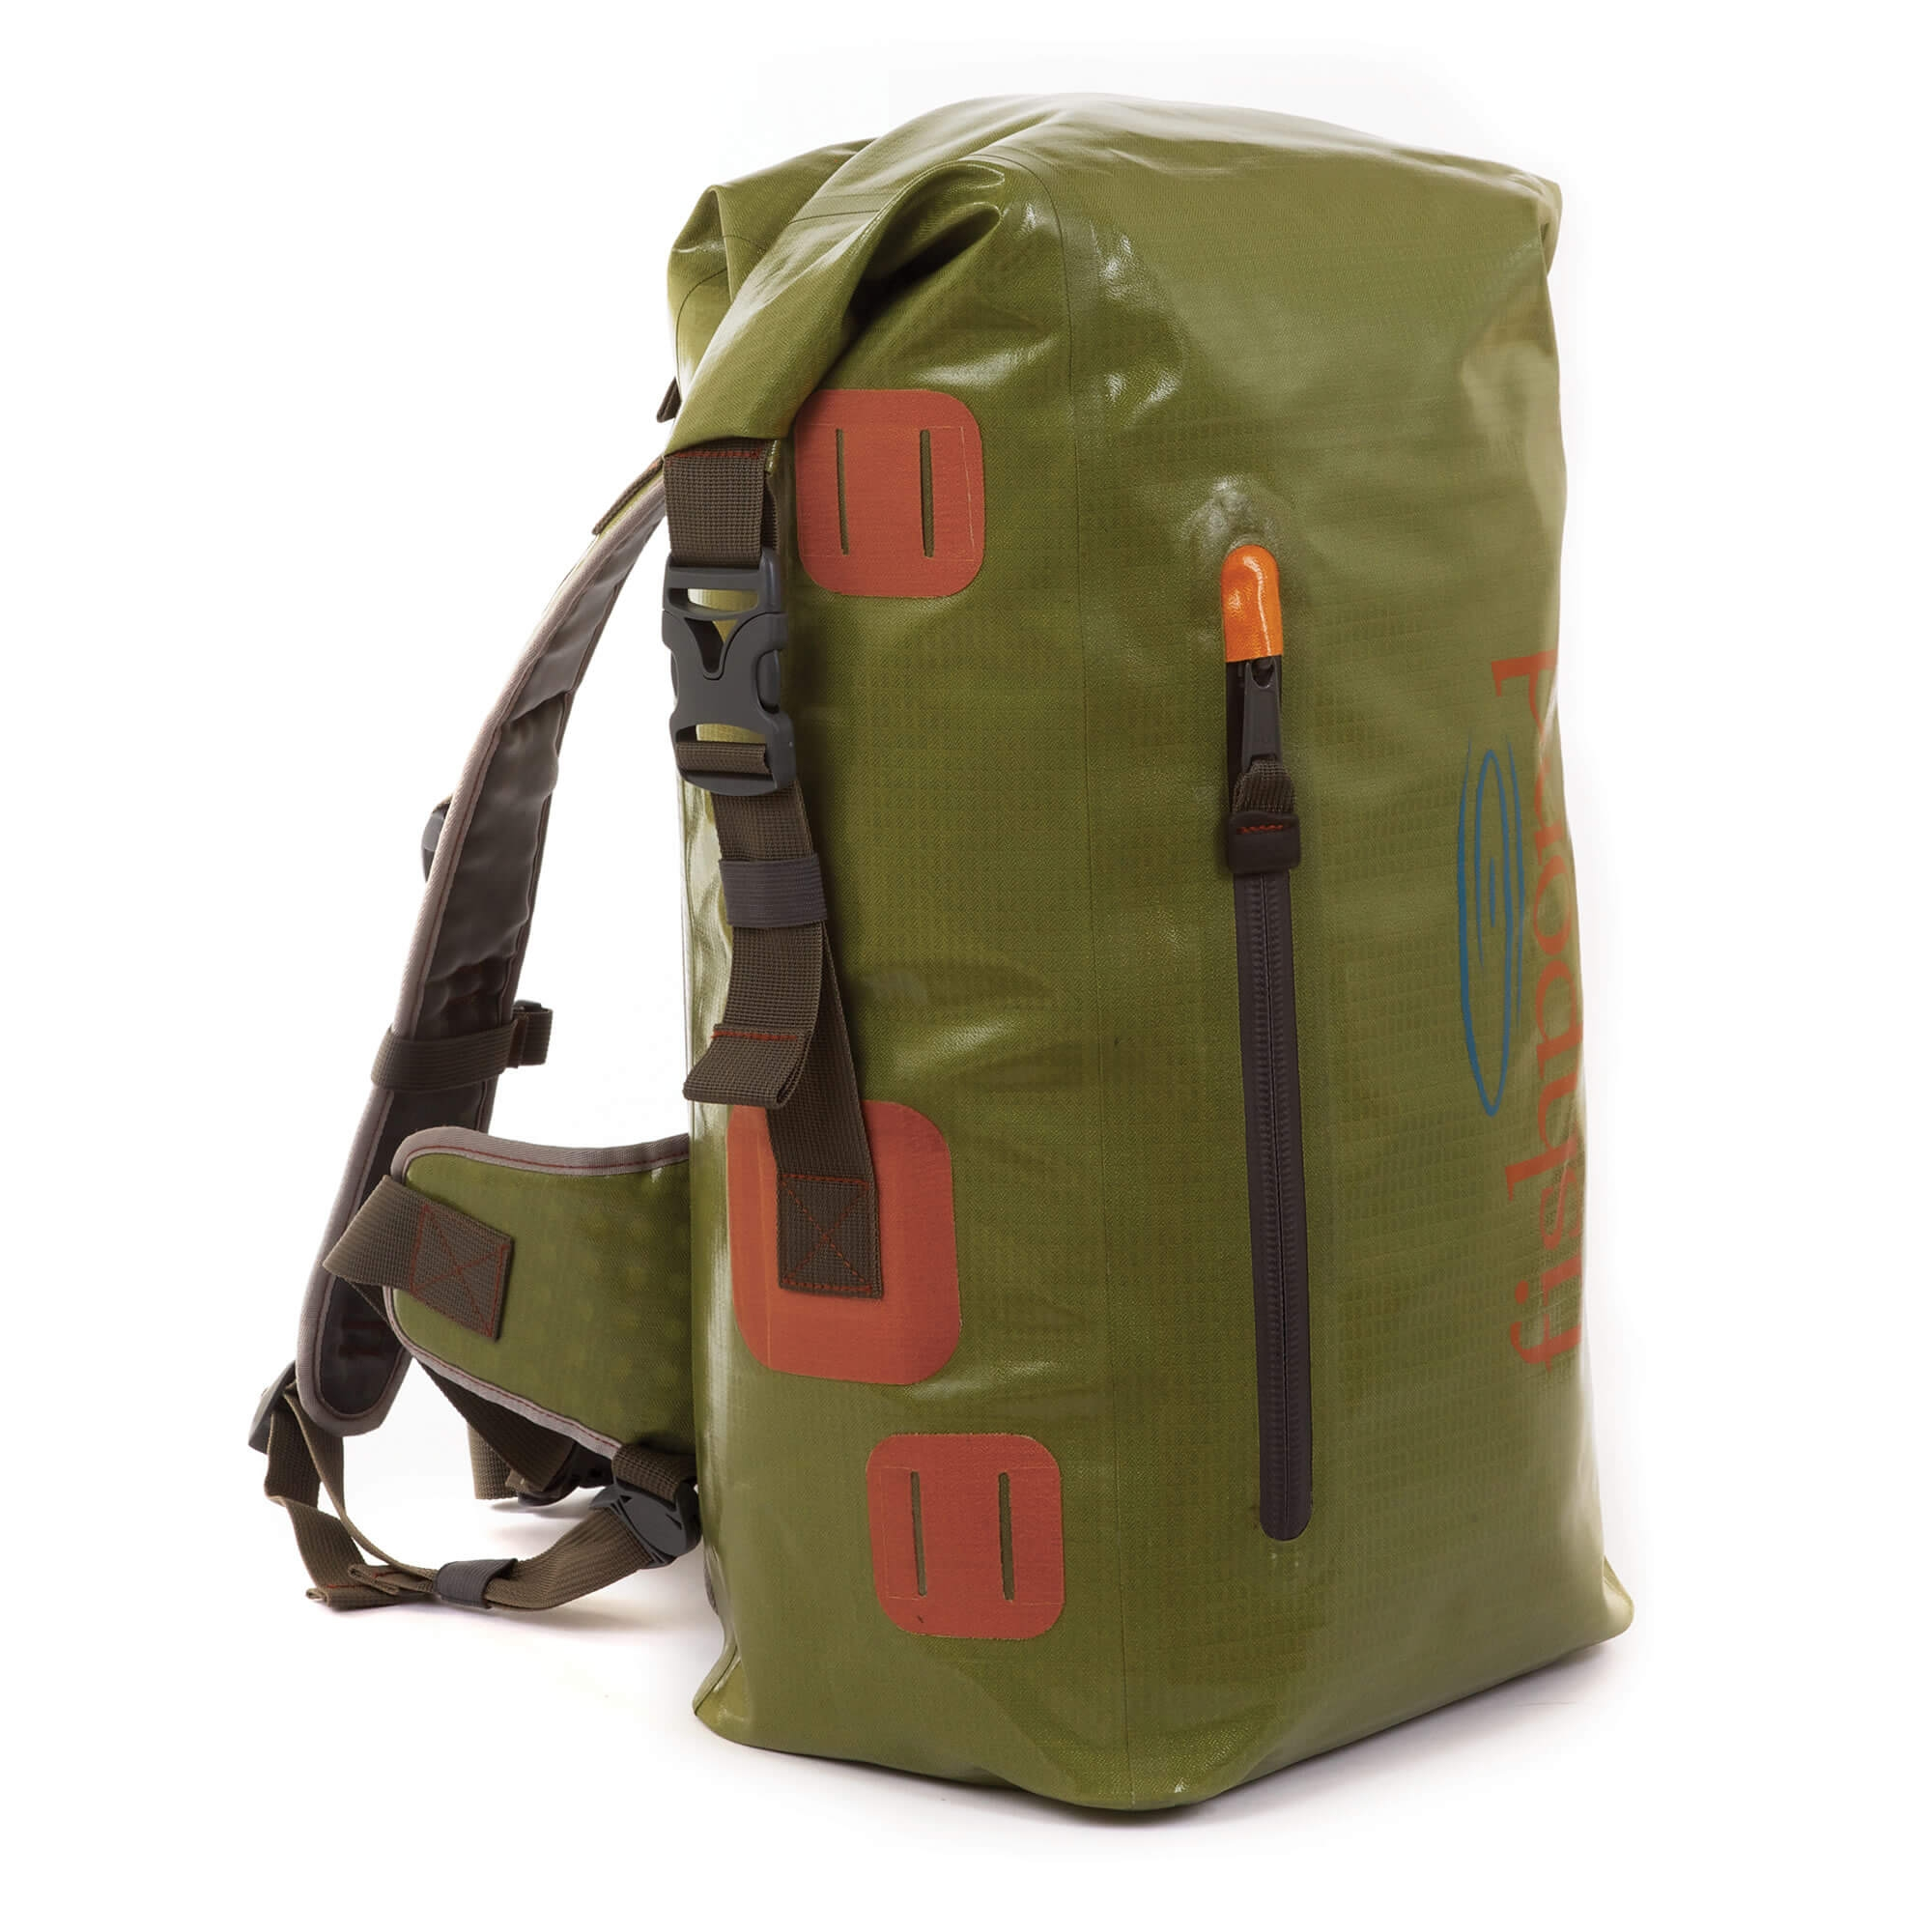 Westwater Roll Top Backpack